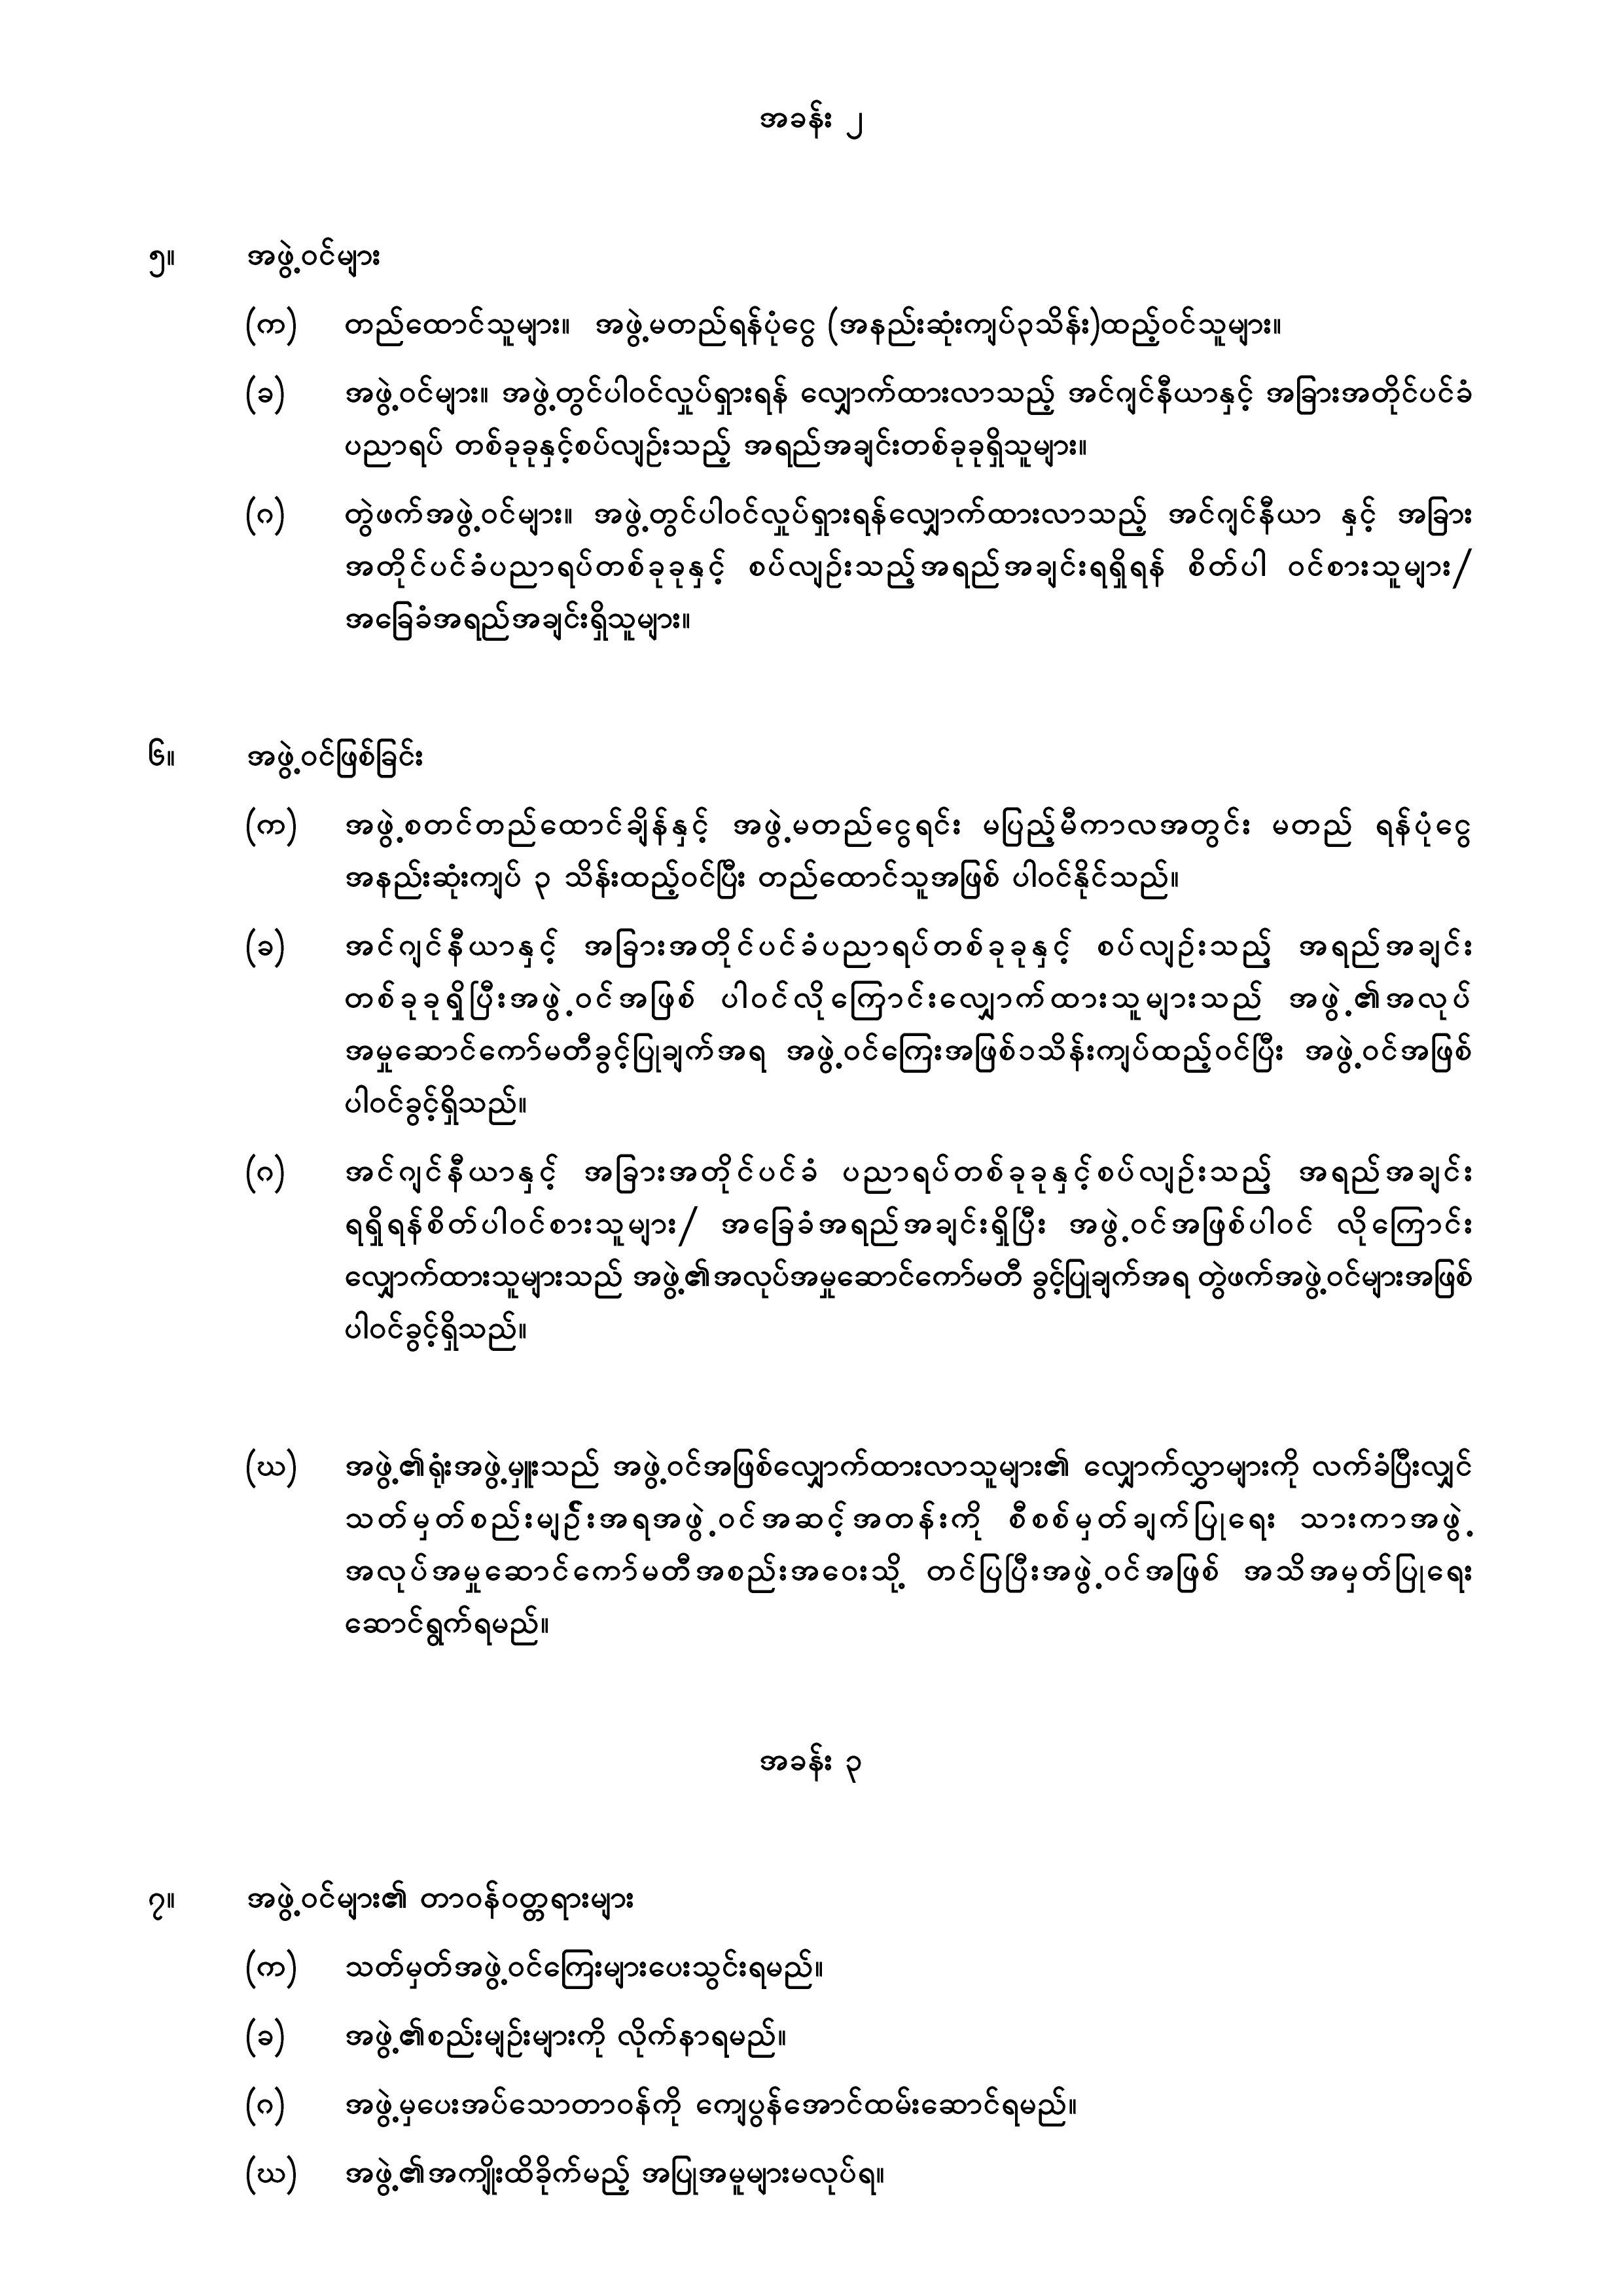 miceg-article-of-association-2